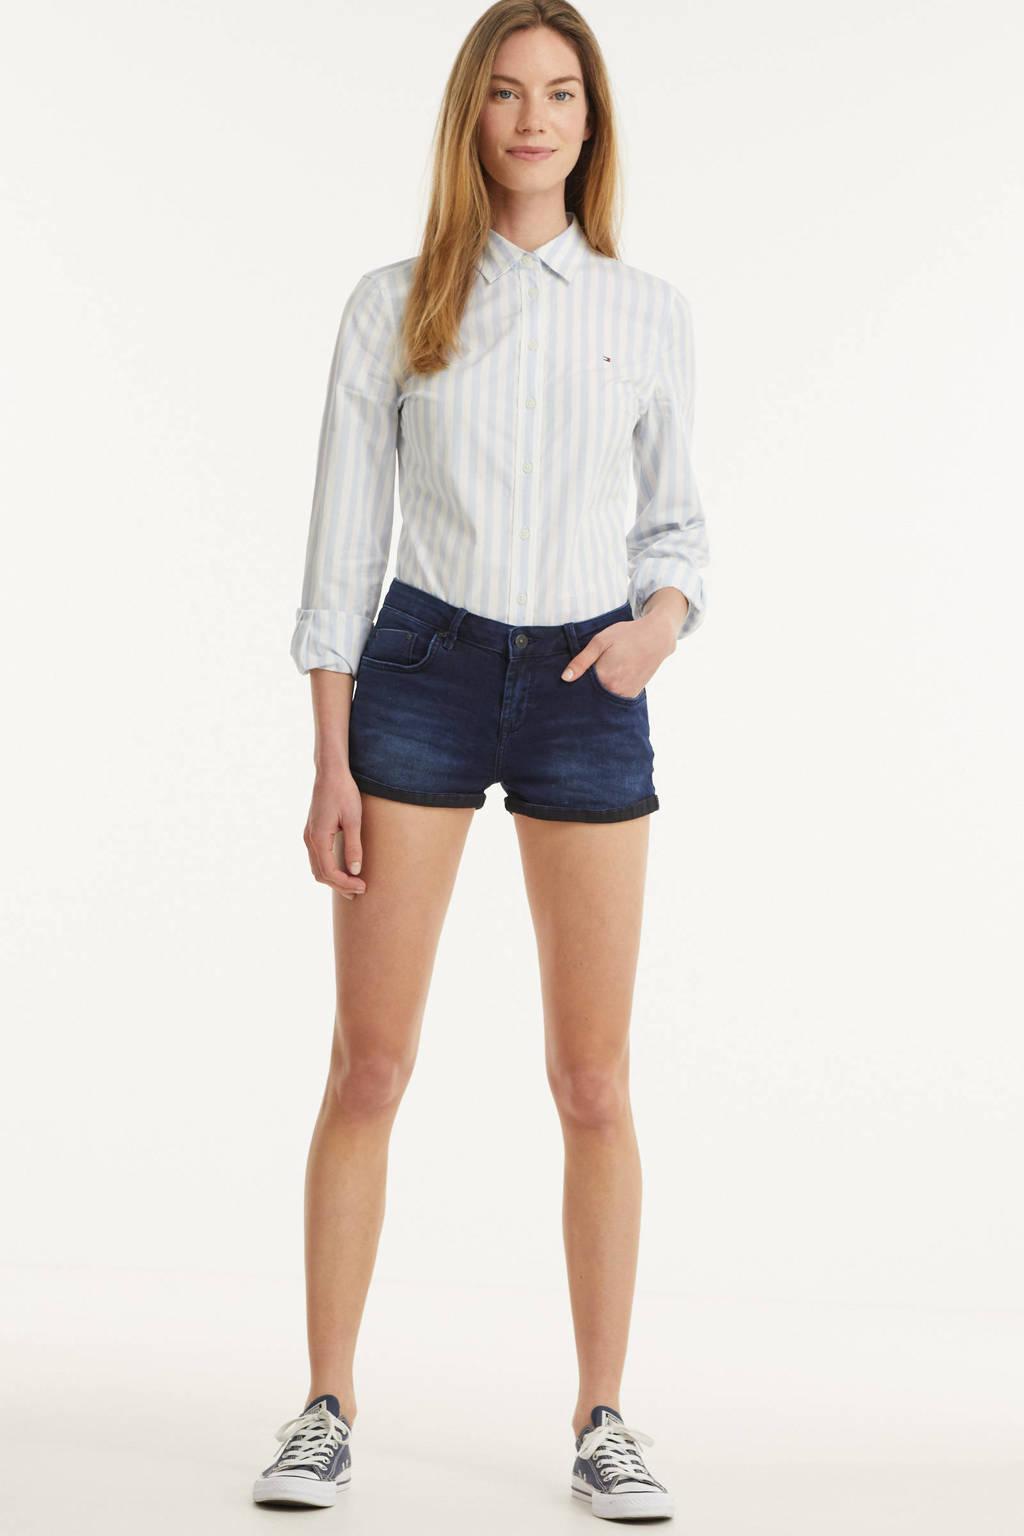 LTB jeans short Judie 53267 patrtiot blue, 53267 Patrtiot blue